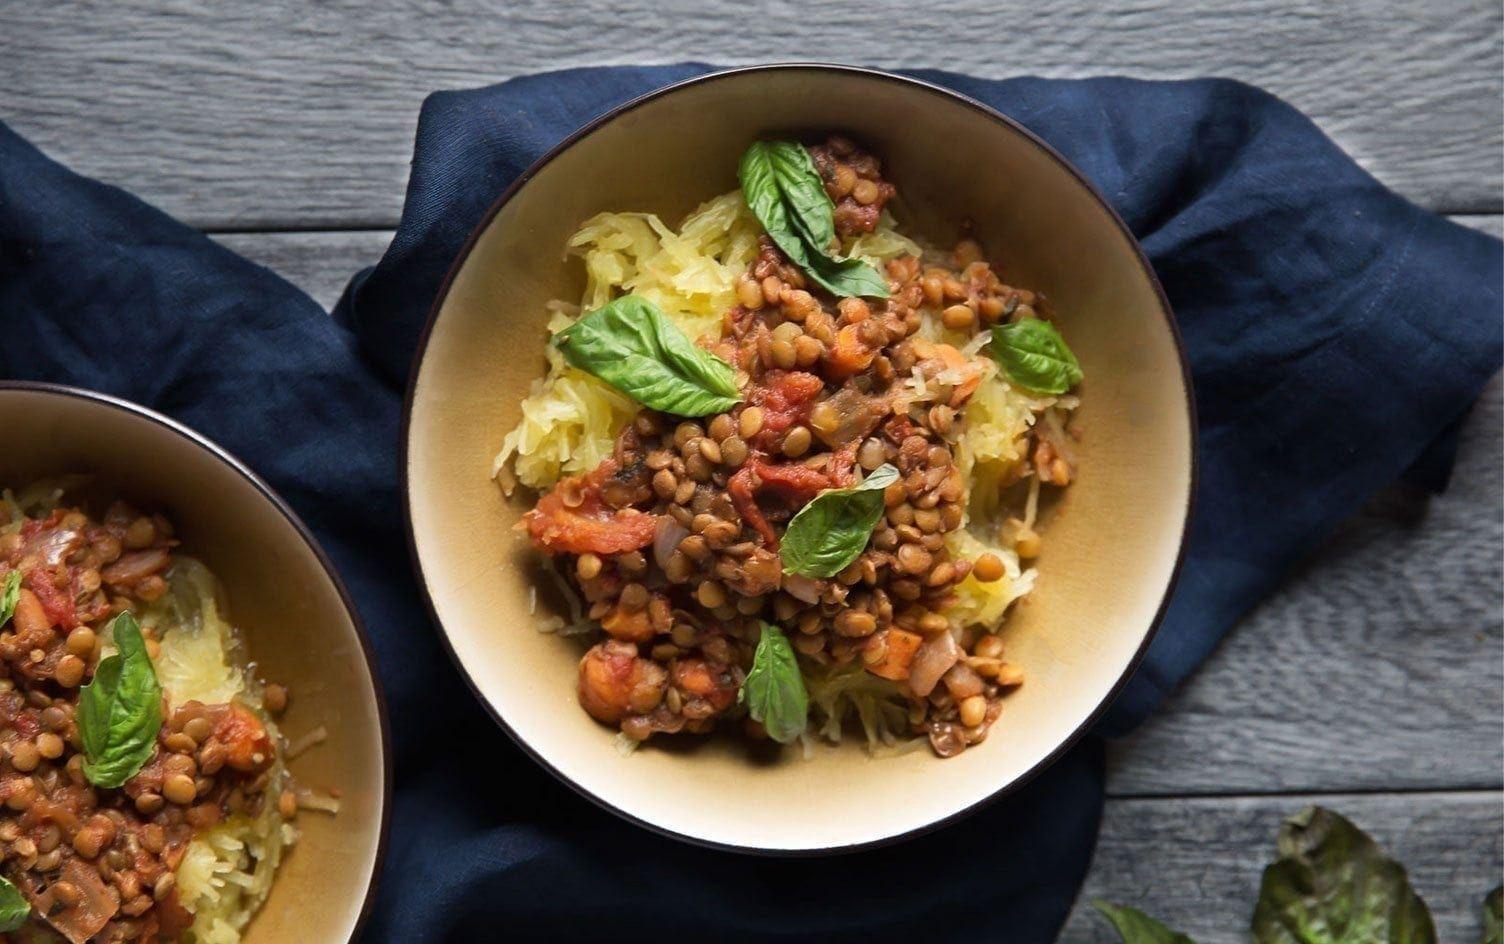 10 Slow Cooker Recipes Under 355 Calories (Beyond Soup